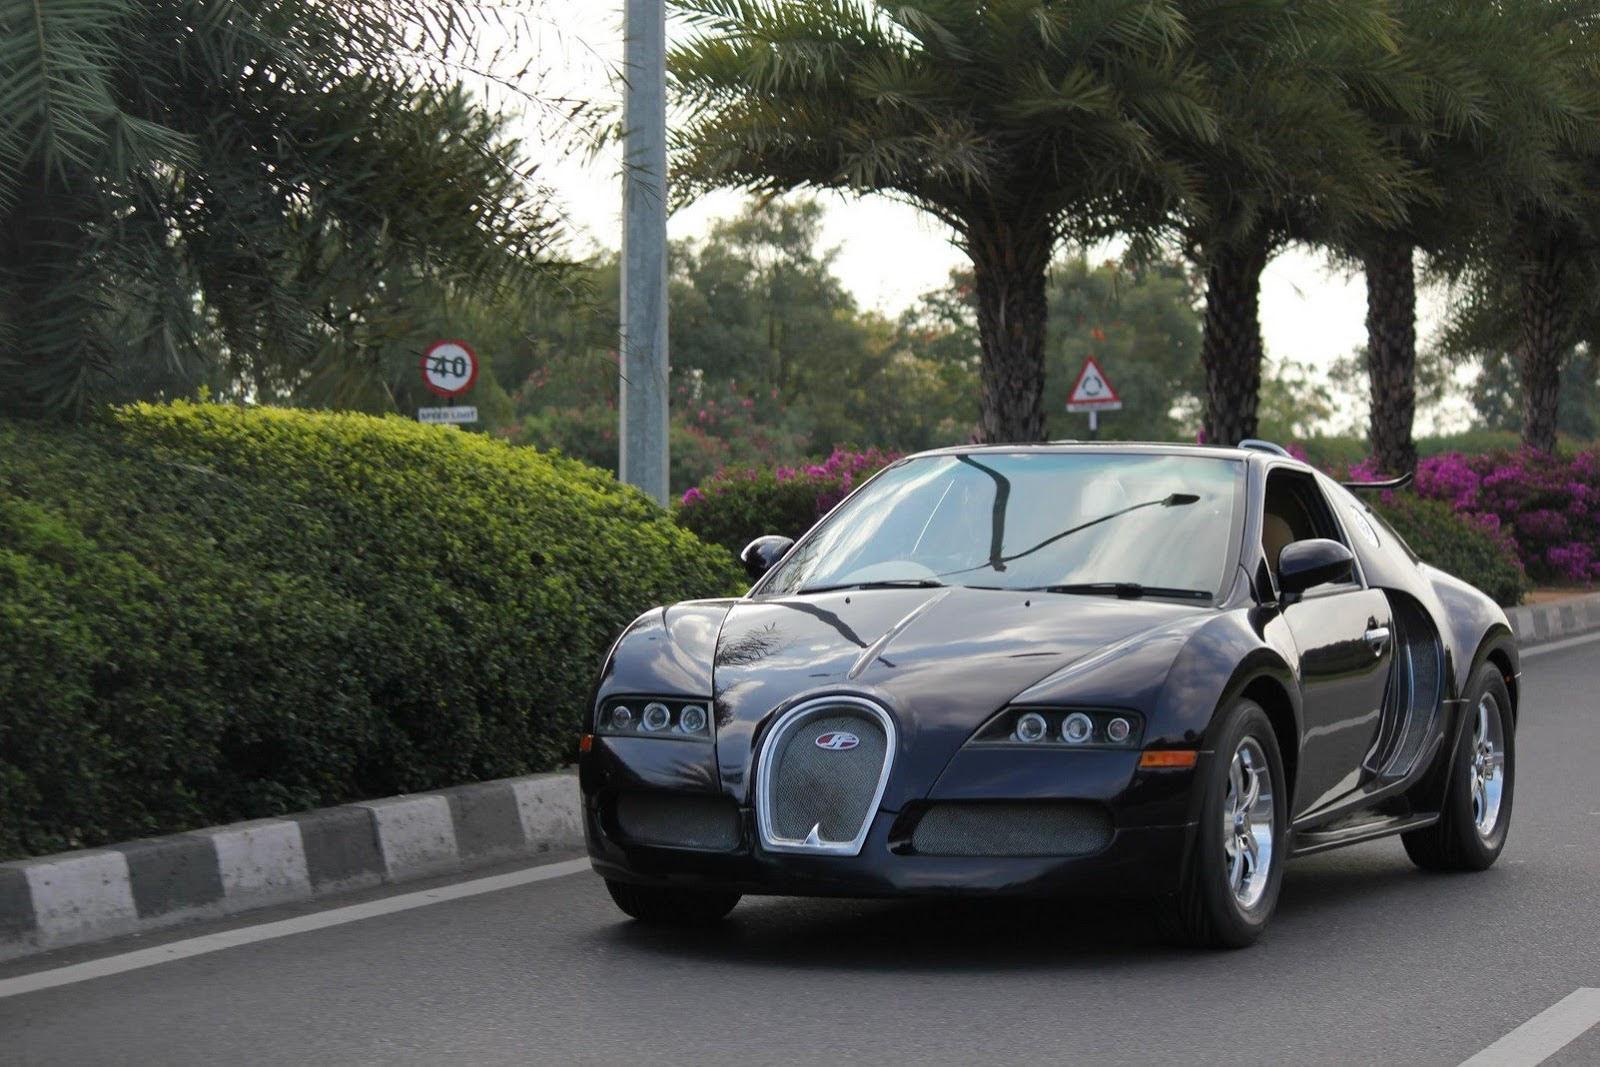 Can't Afford a Bugatti Veyron? How About a Suzuki-Based Replica? - autoevolution